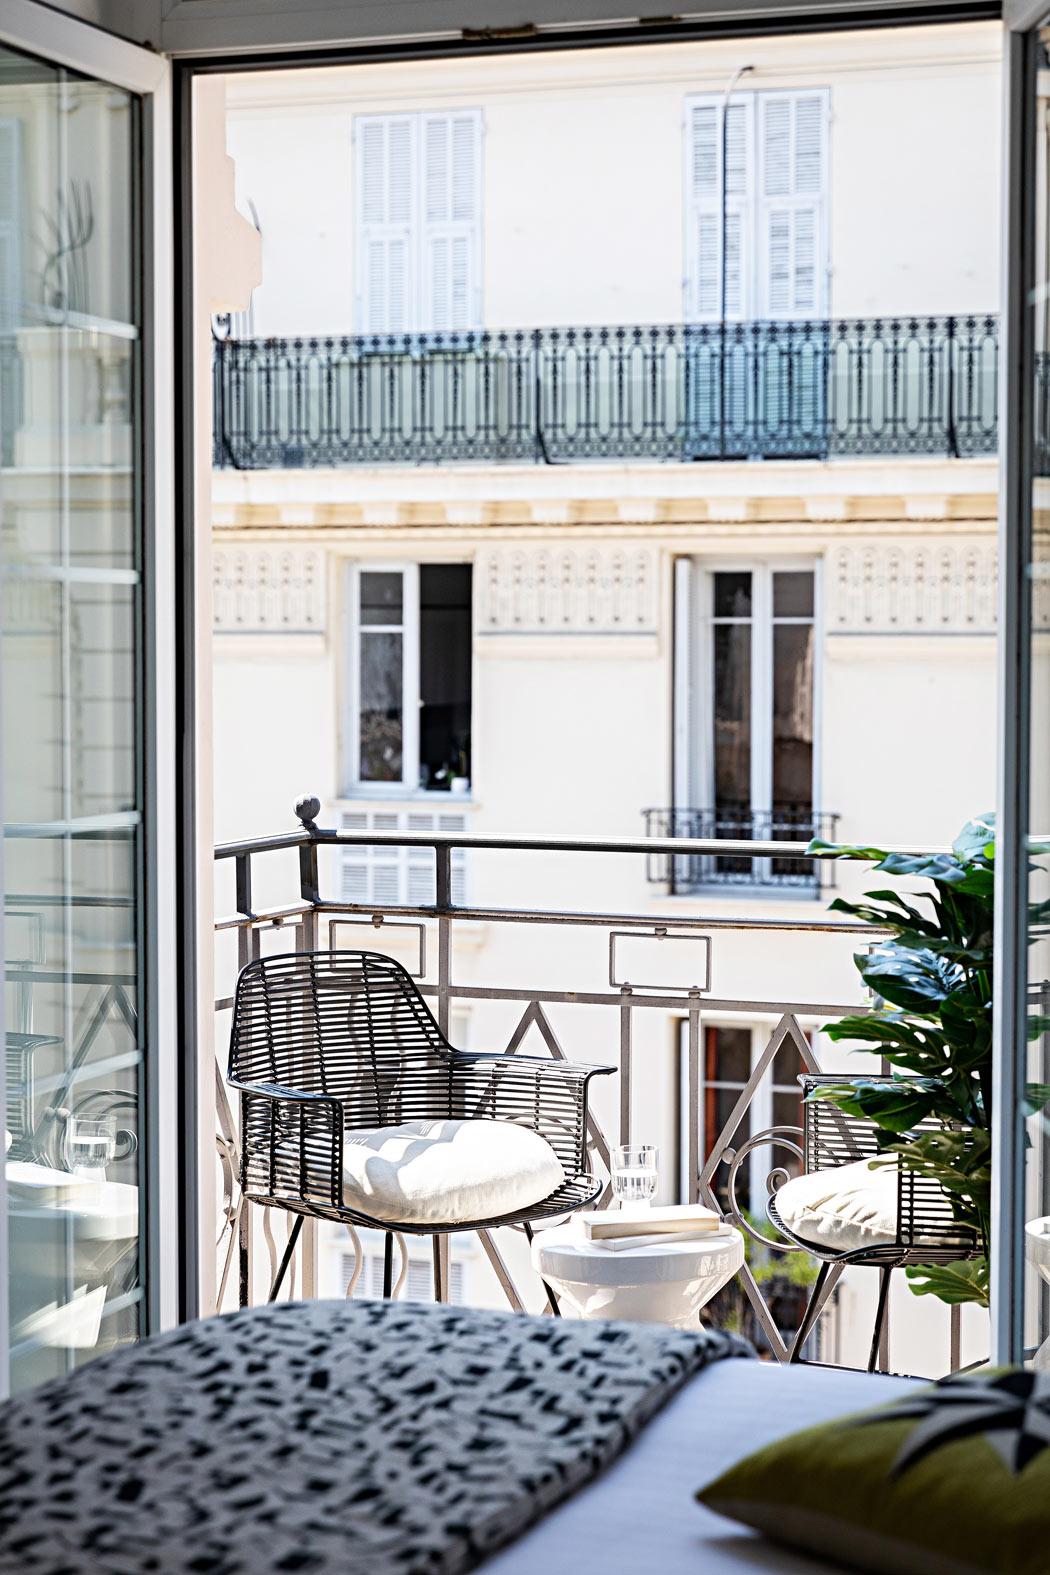 Hotel Riviera Collection - Balcon